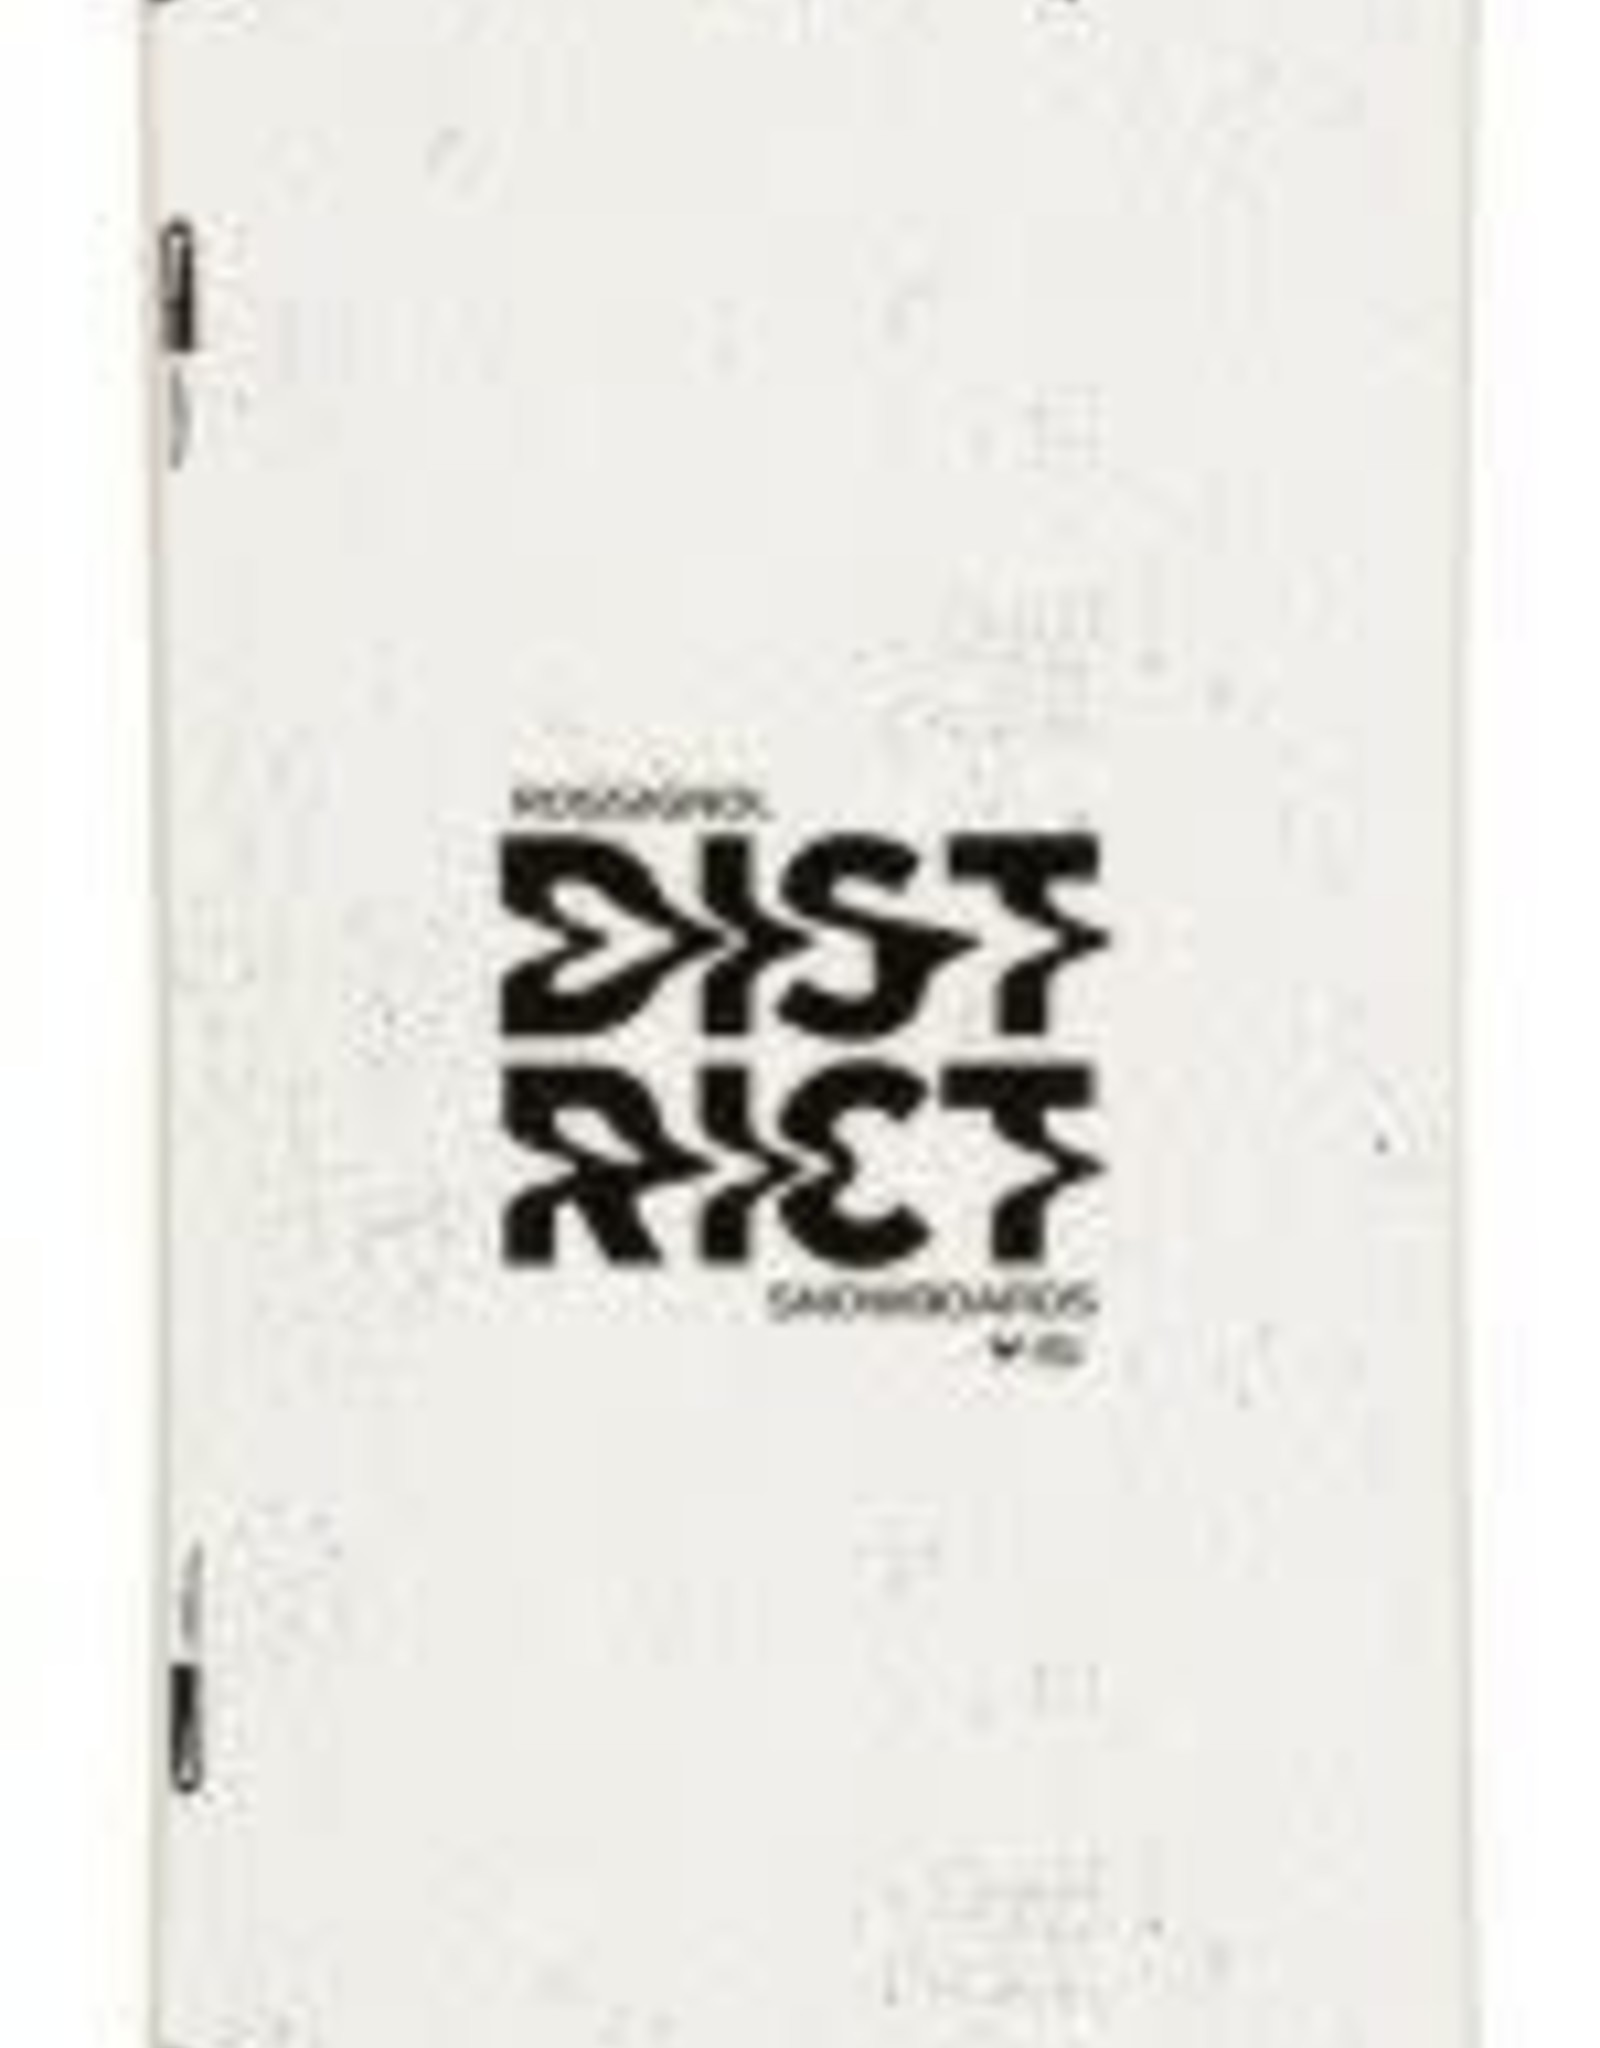 Rossignol Copy of Rossignol - DISTRICT AMPTEK (2017) -